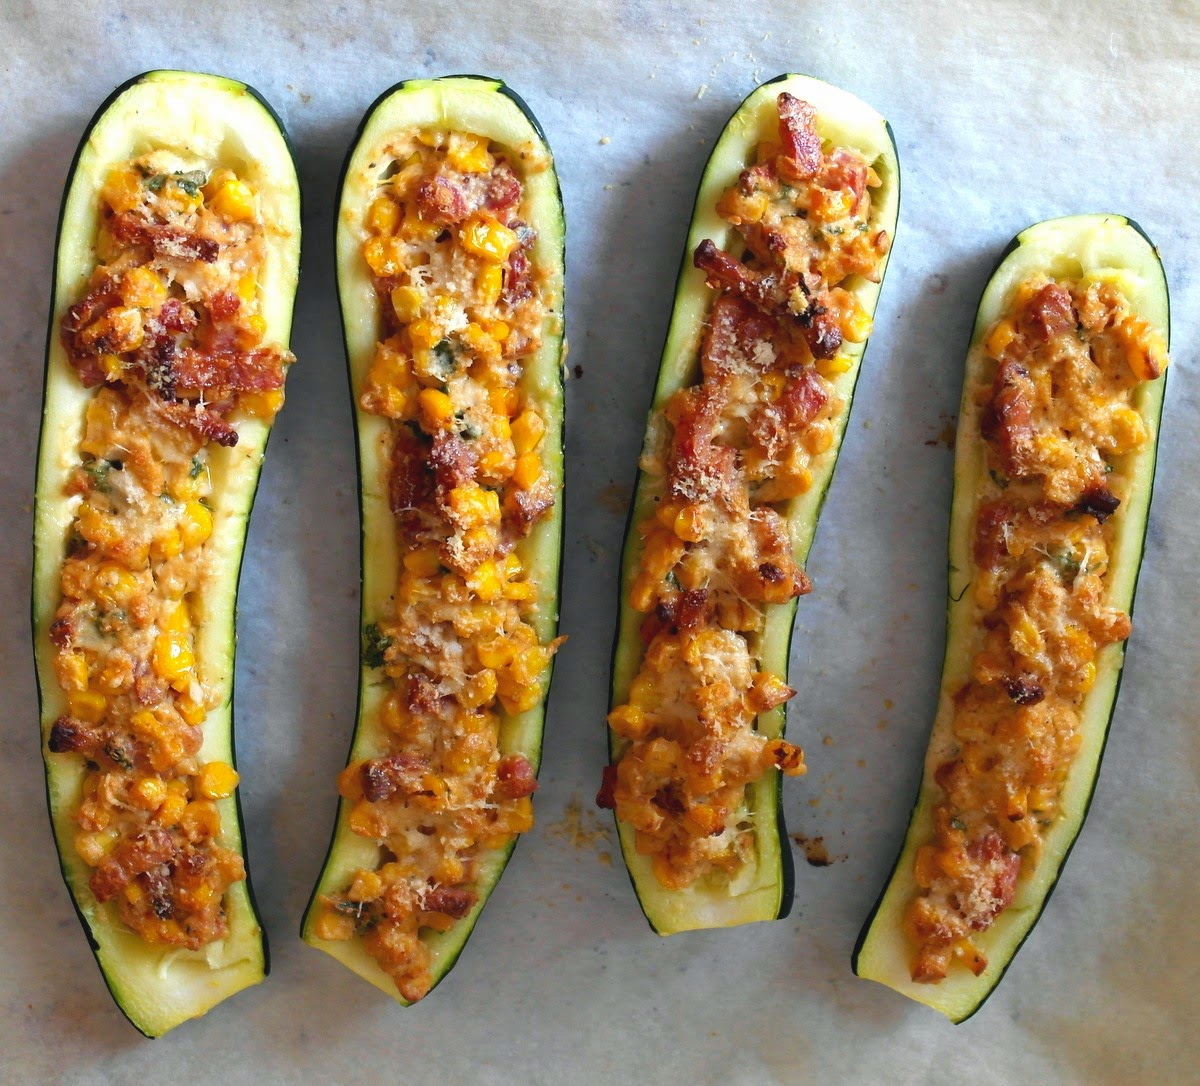 carpe culina gef llte zucchini aus dem ofen mit bacon. Black Bedroom Furniture Sets. Home Design Ideas